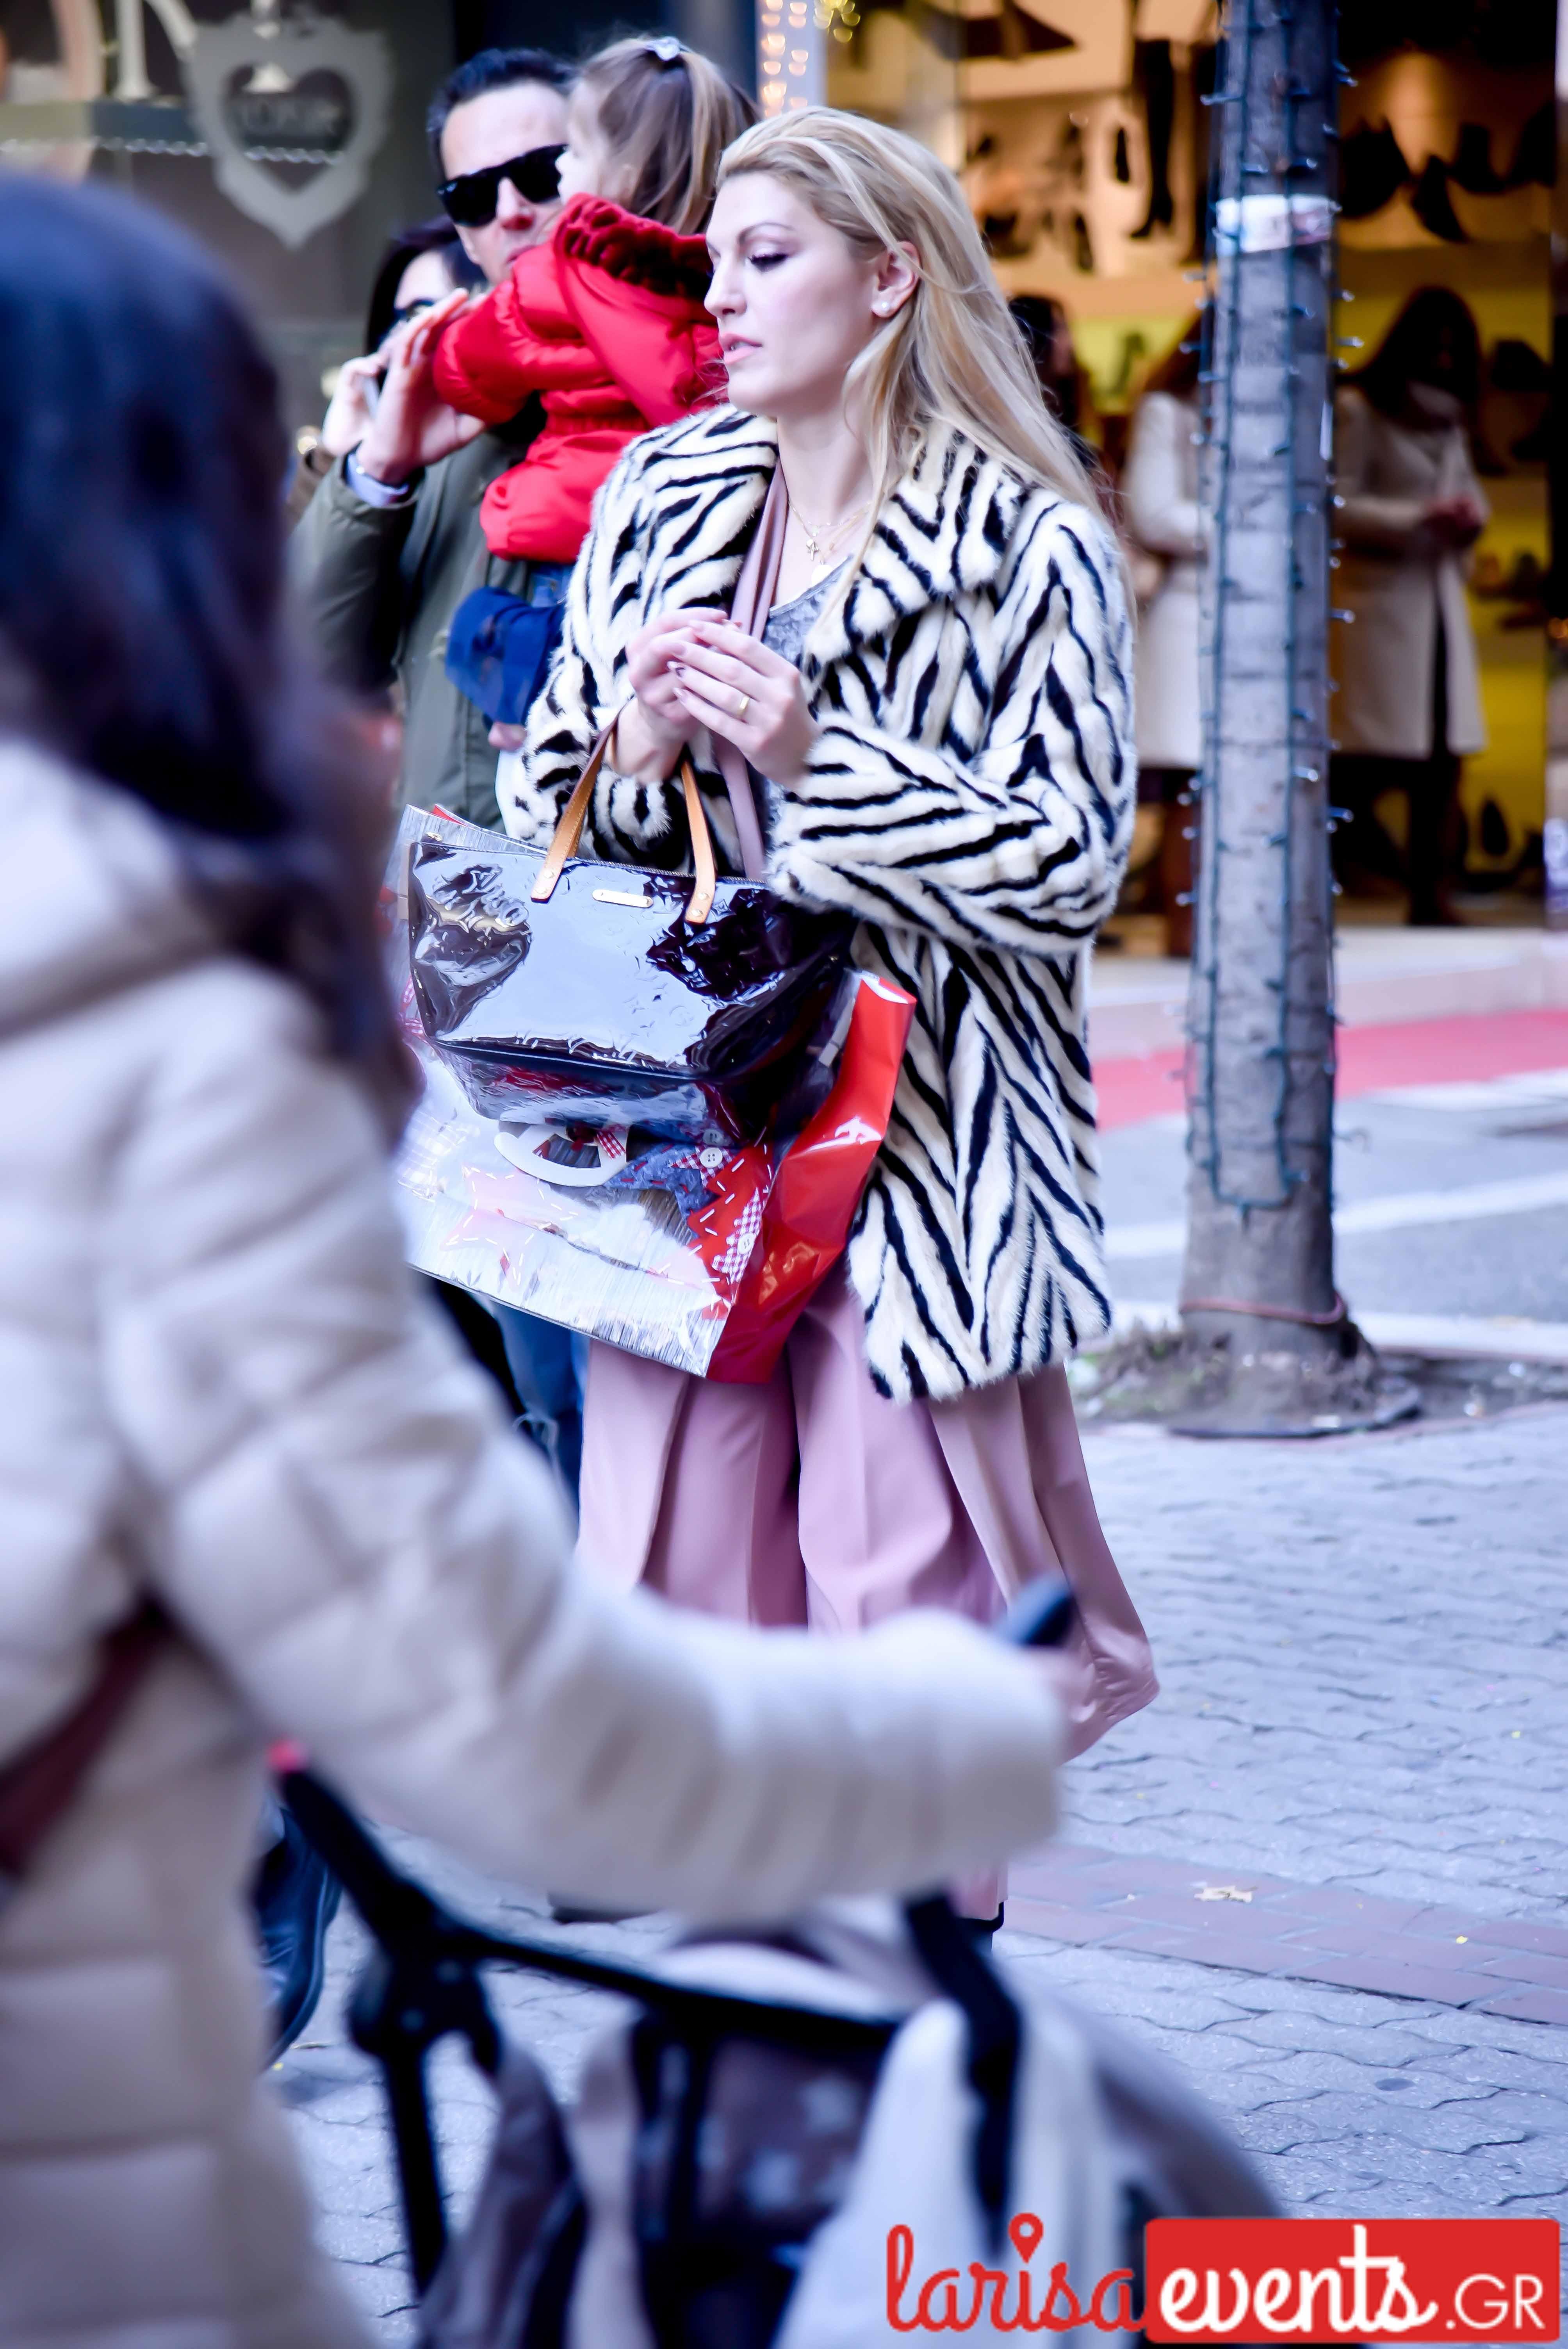 LAZ 7408 - Λάρισα's Street Style | Οι γυναίκες της πόλης σε street style clicks!